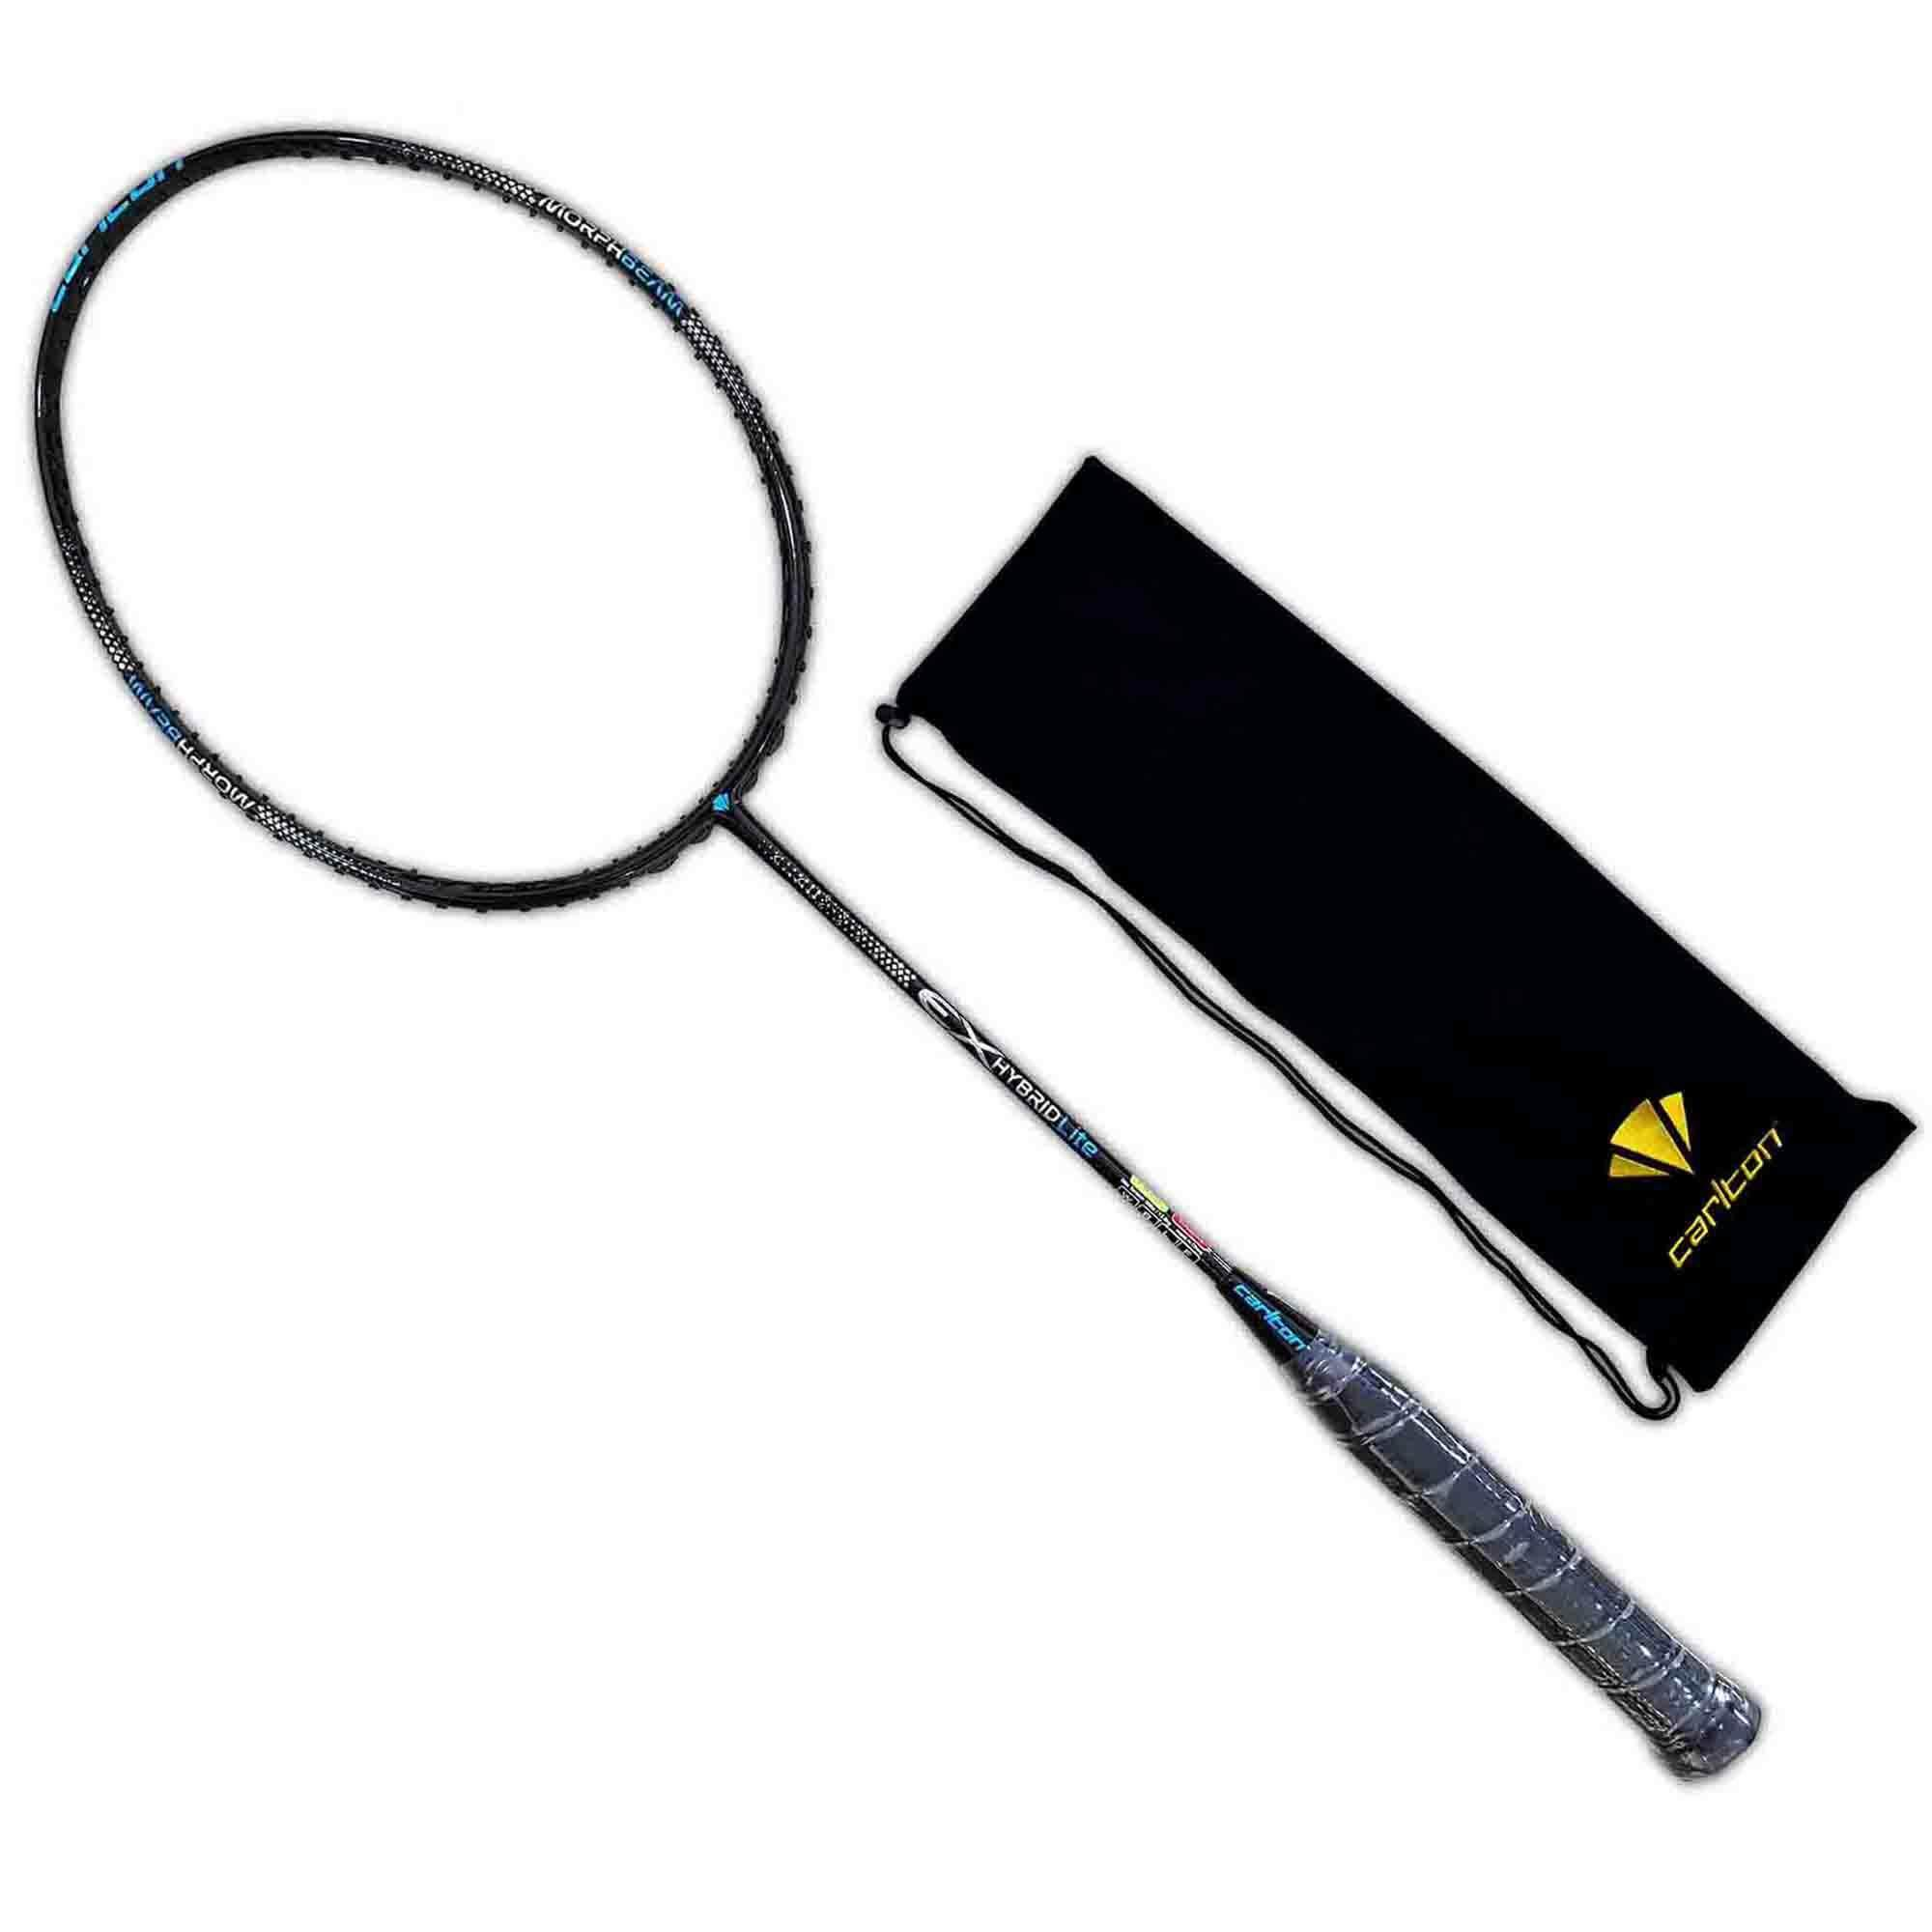 Carlton Badminton Racket Ex-Hybird Lite